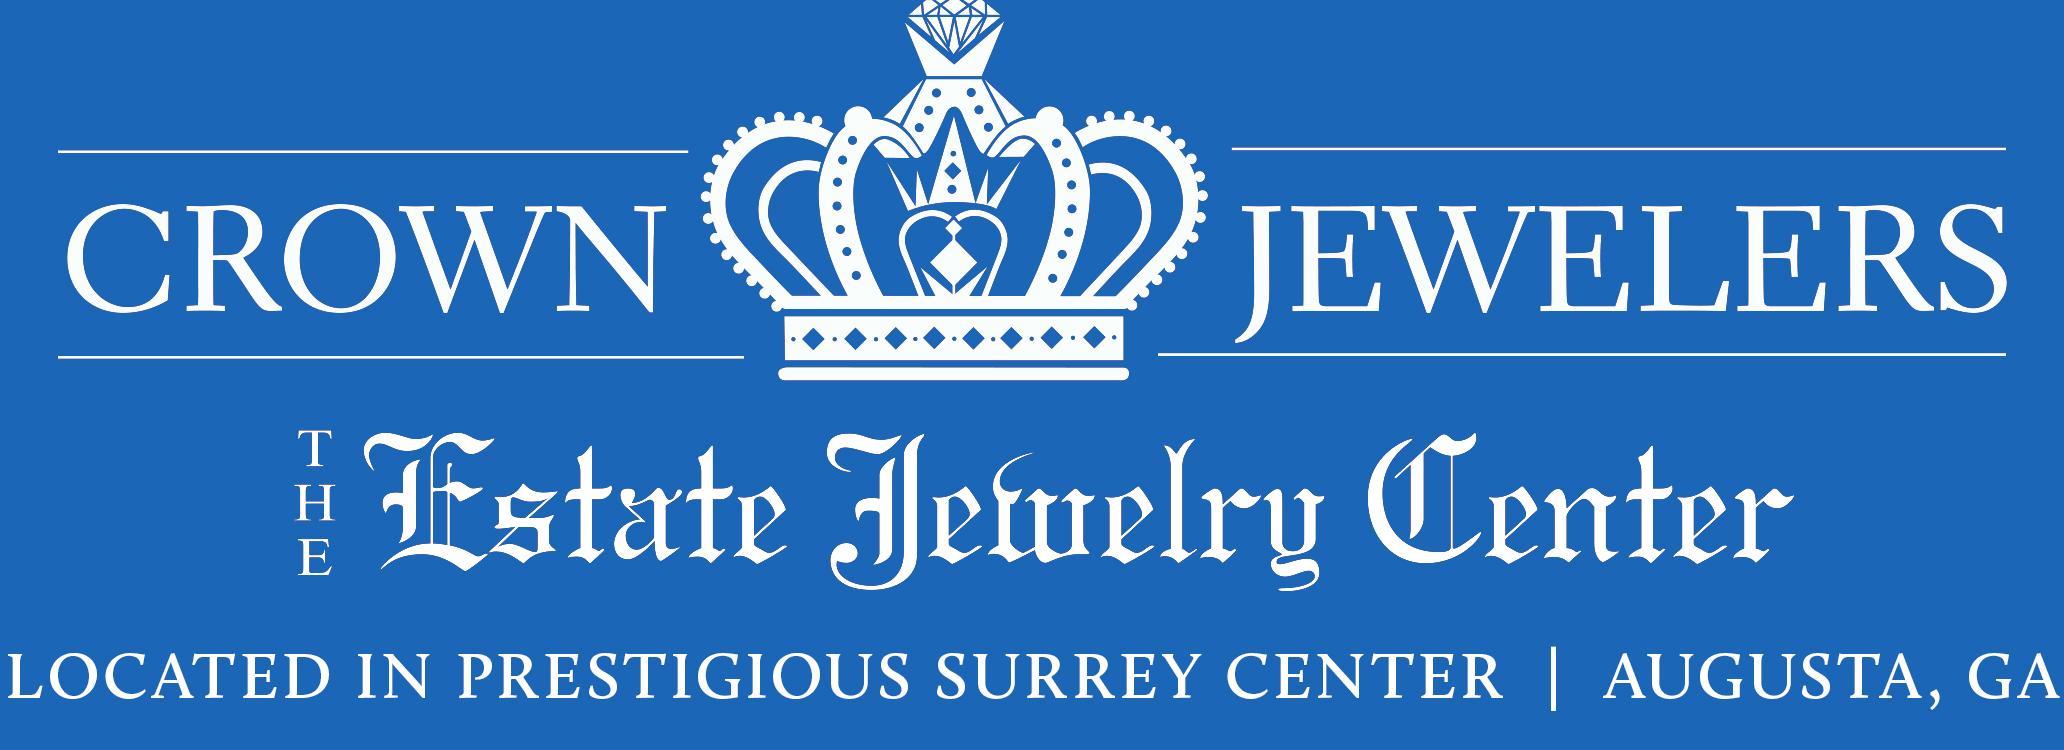 Crown Jewelers logo